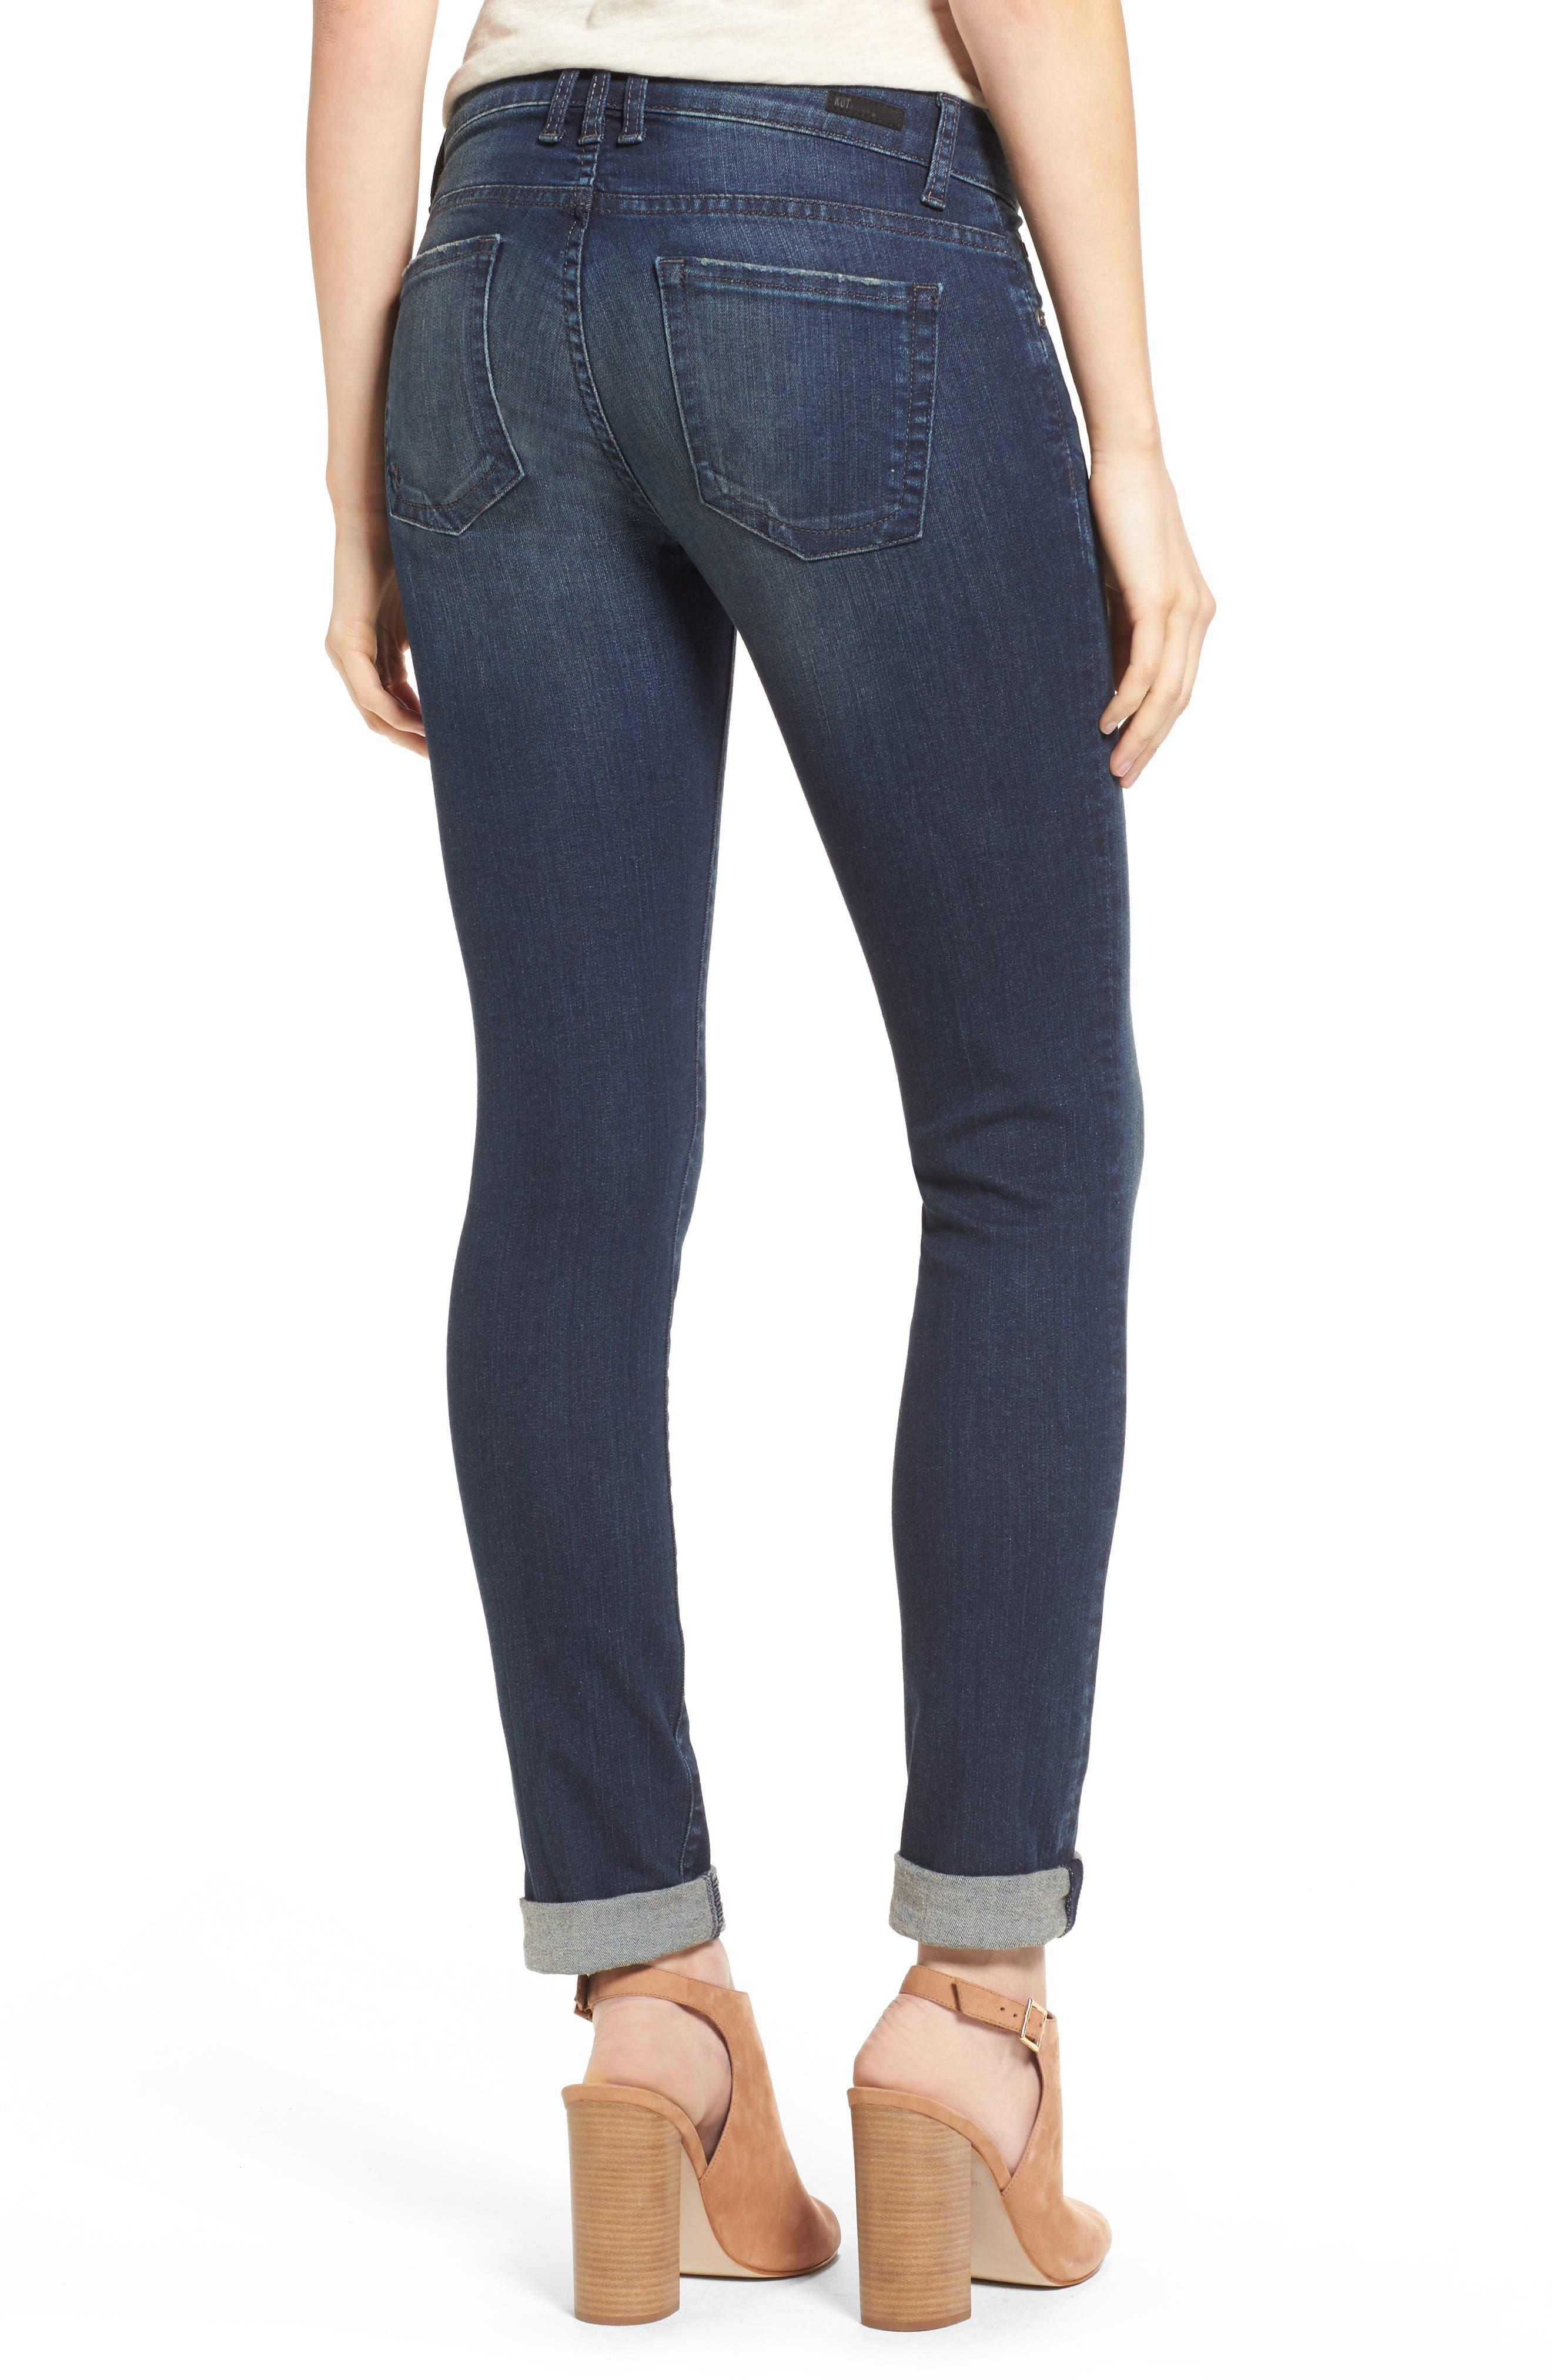 KUT from the Kloth 'Catherine' Slim Boyfriend Jeans (Carefulness) (Regular & Petite)